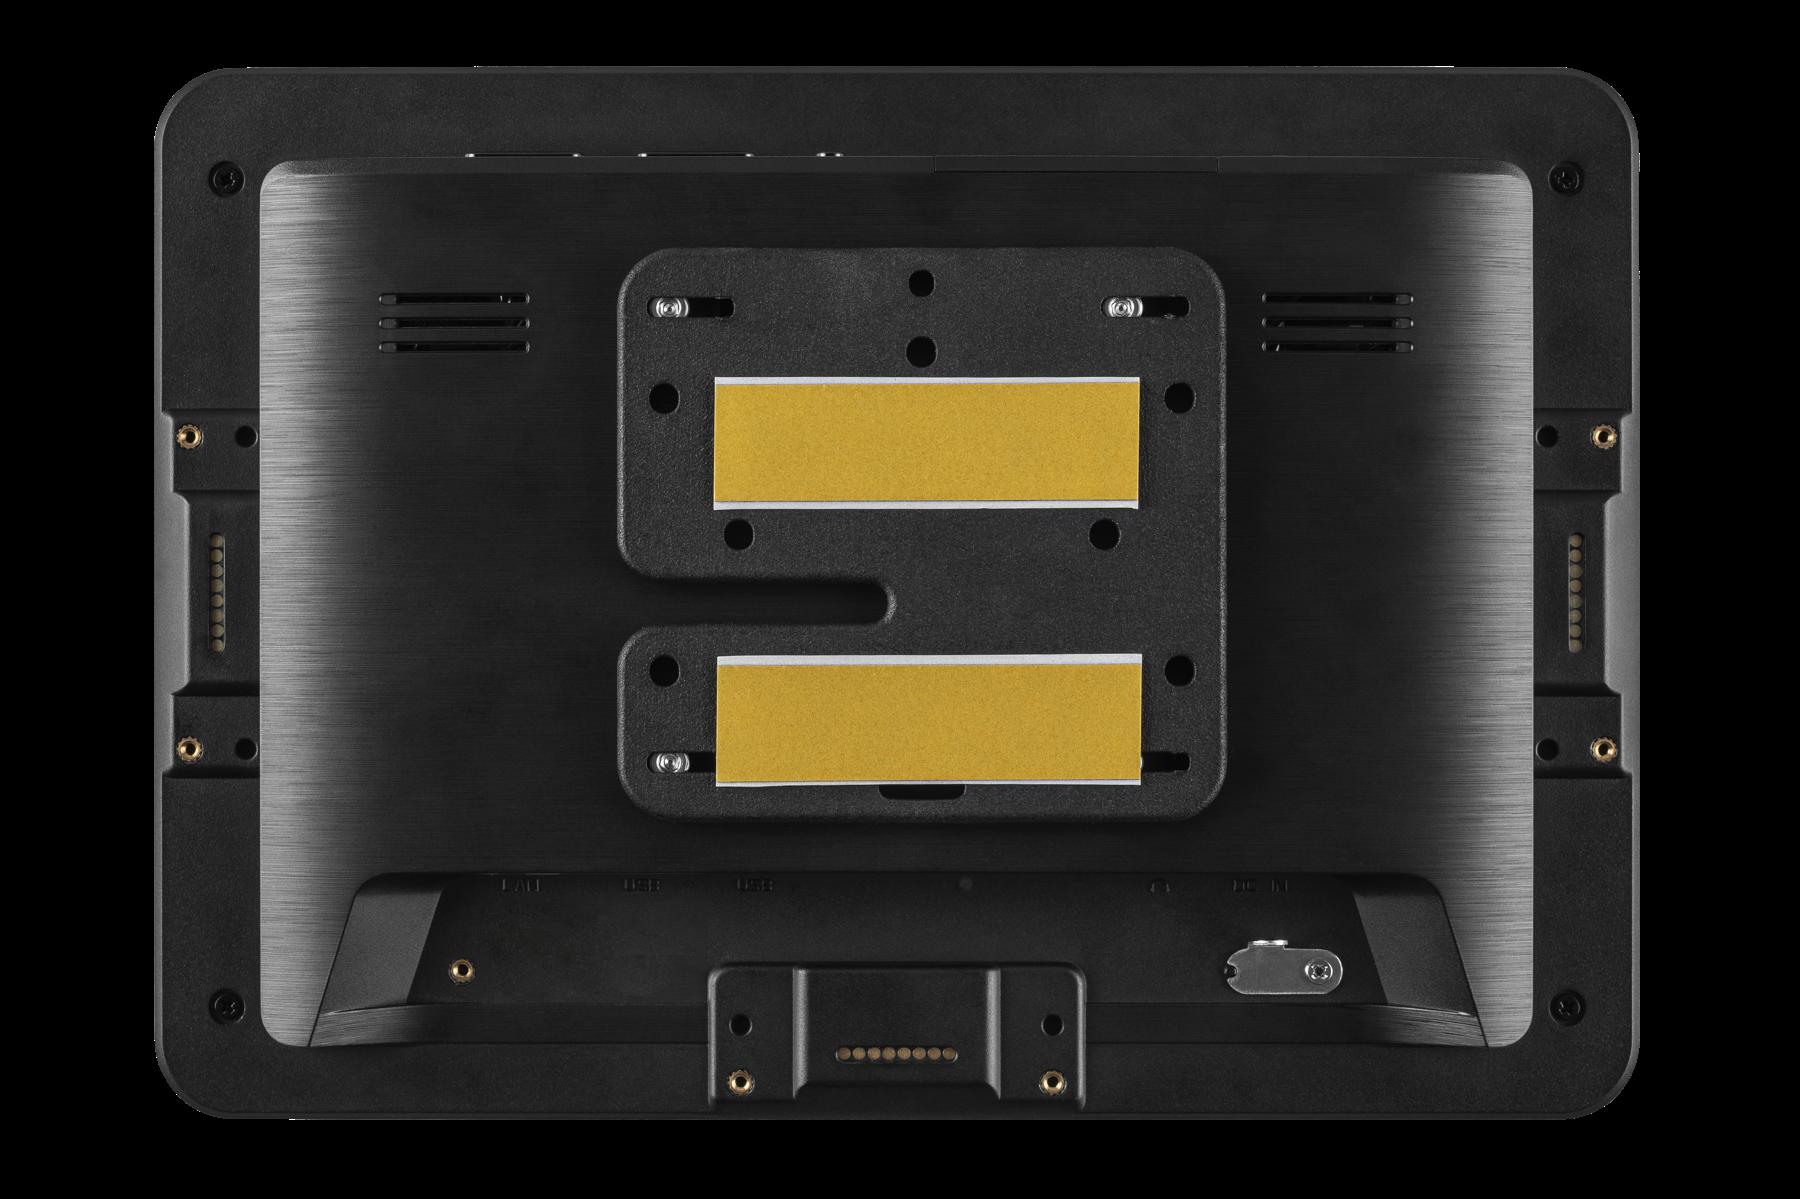 99991010 160 GM 75 Single Plate on 10 inch display s1800x